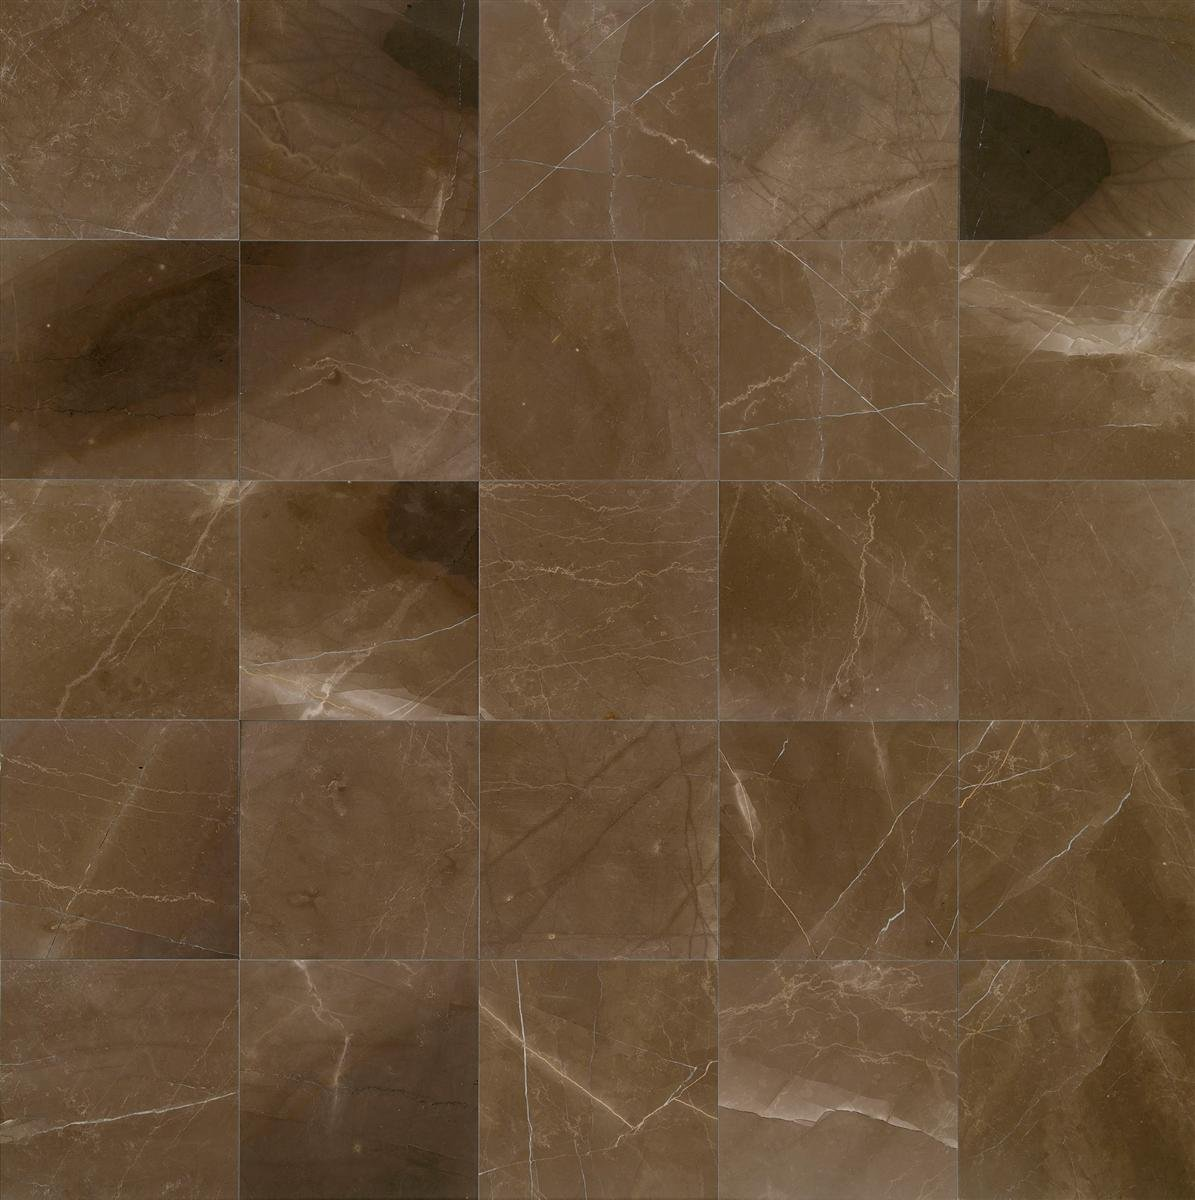 Gris pulpis de m rmoles serrat focus piedra noticias for Piedra caliza gris